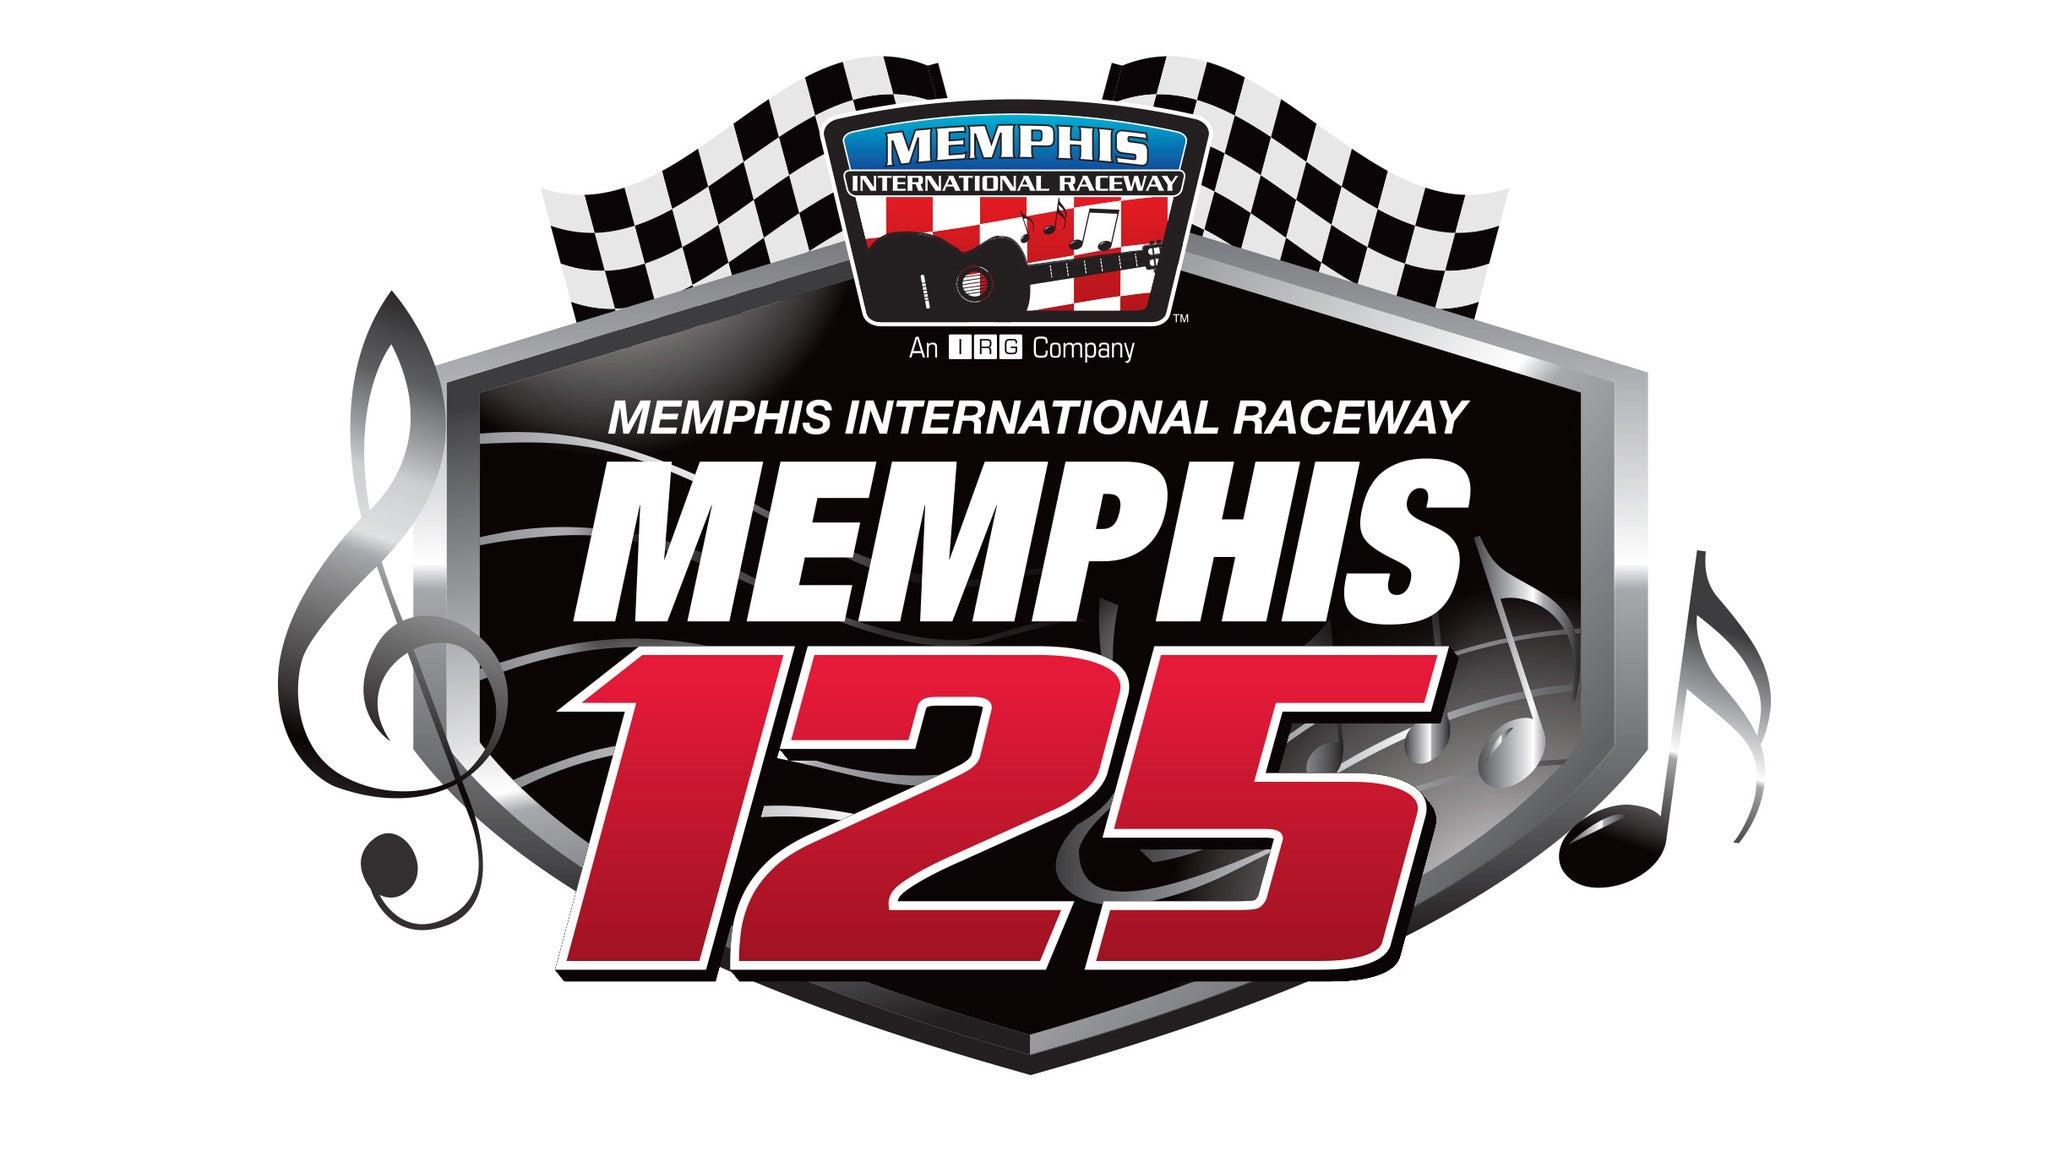 Memphis 125 Open Practice at Memphis International Raceway